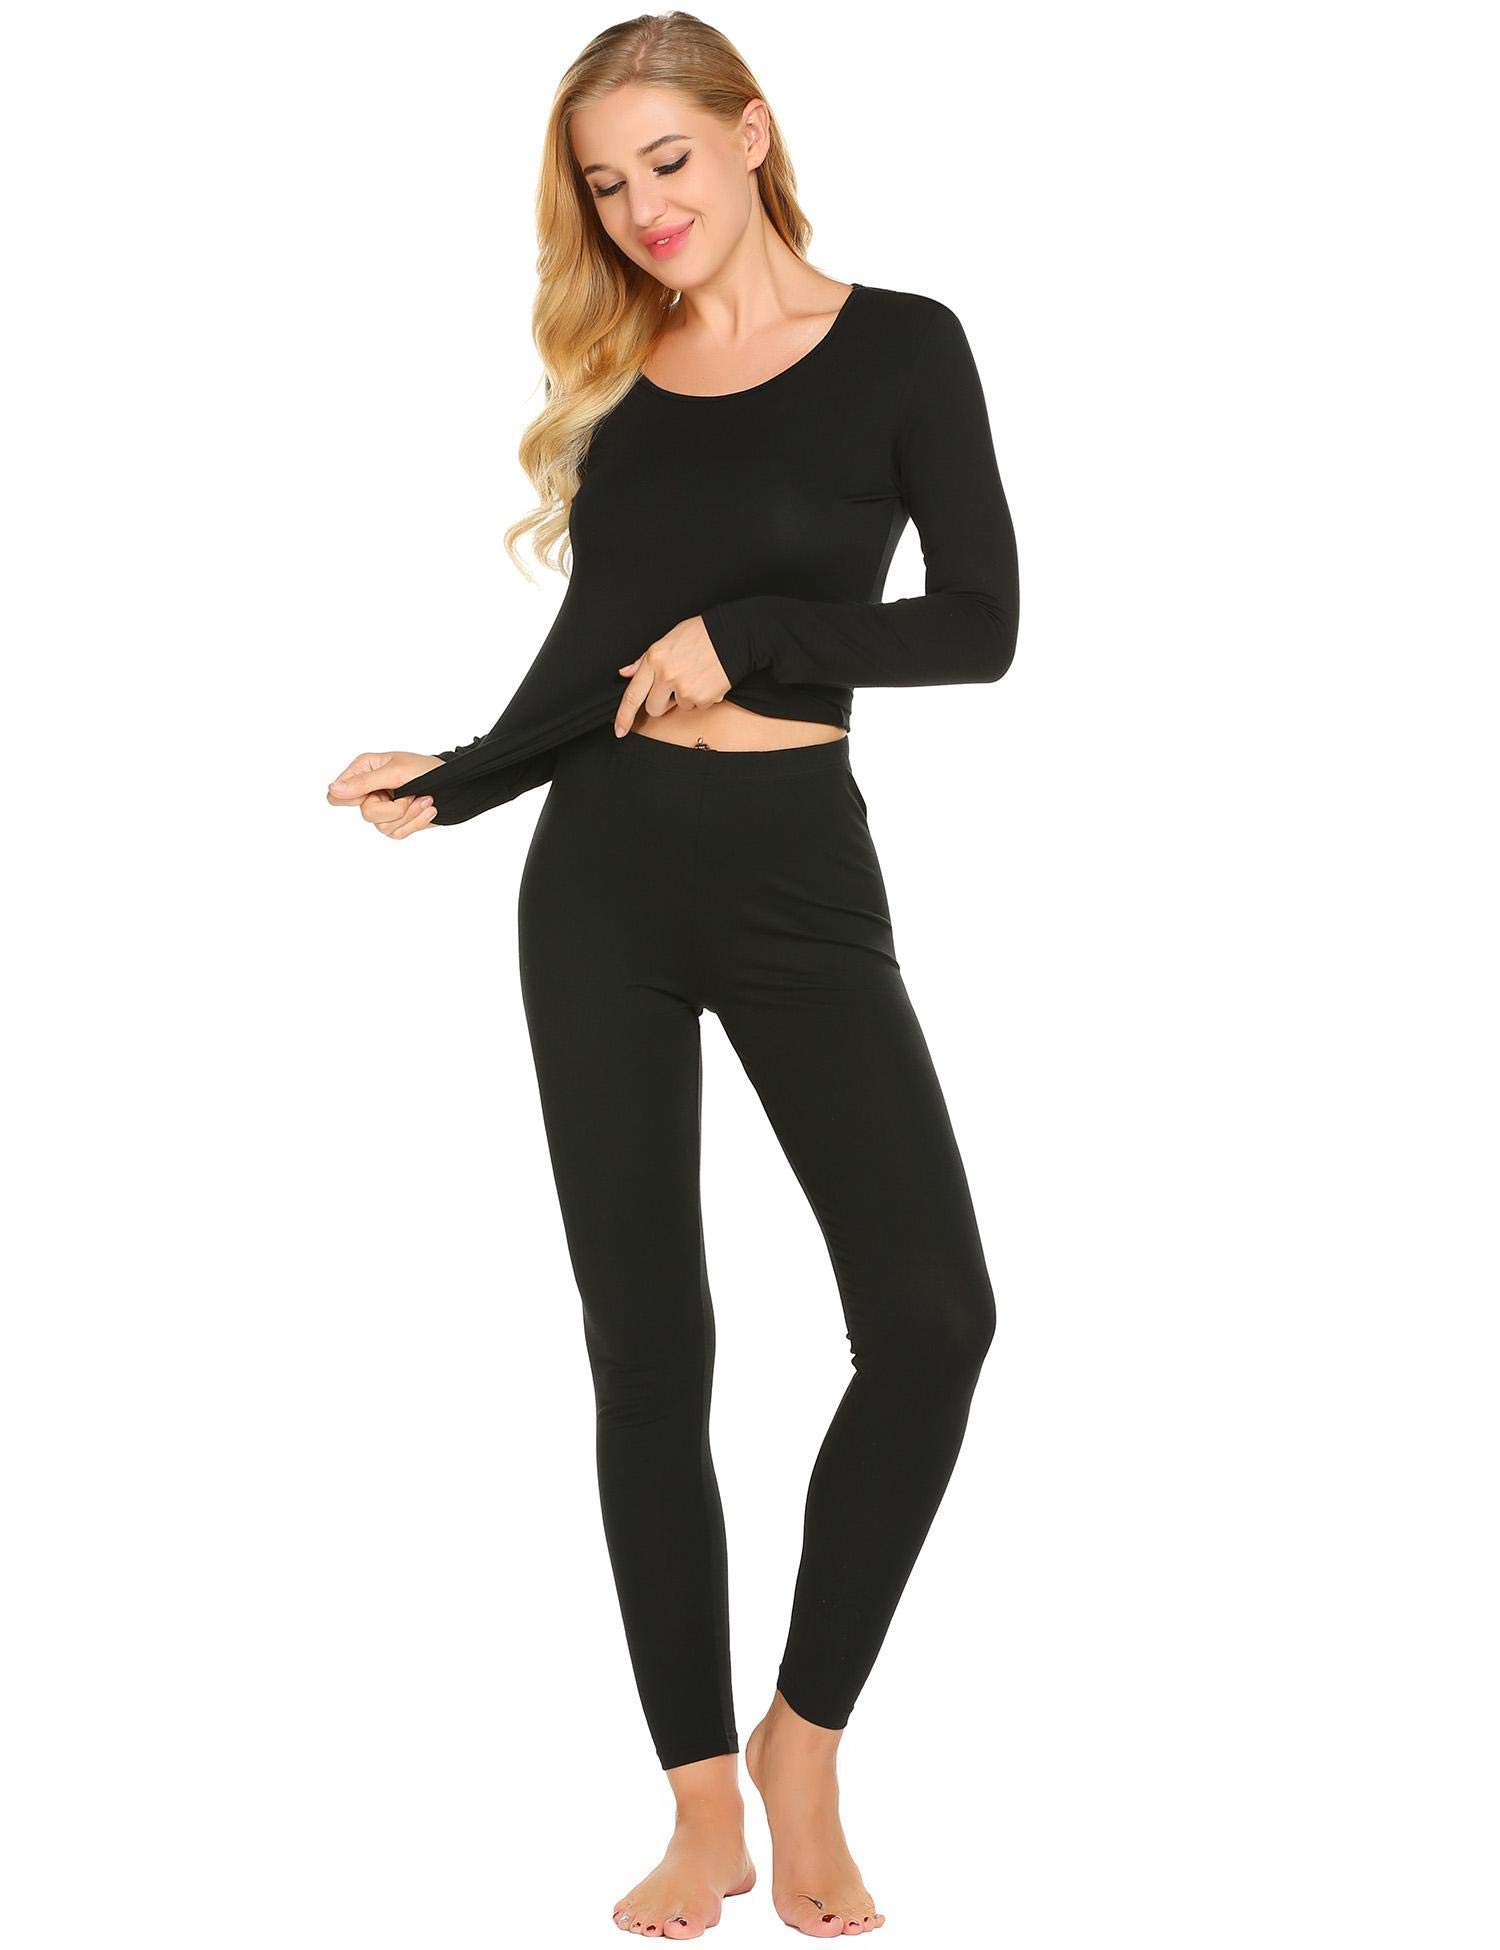 Langle Women's Autumn Comfort Sleepwear Long Sleeve Top and Pants Thermal Set (Black, Medium)